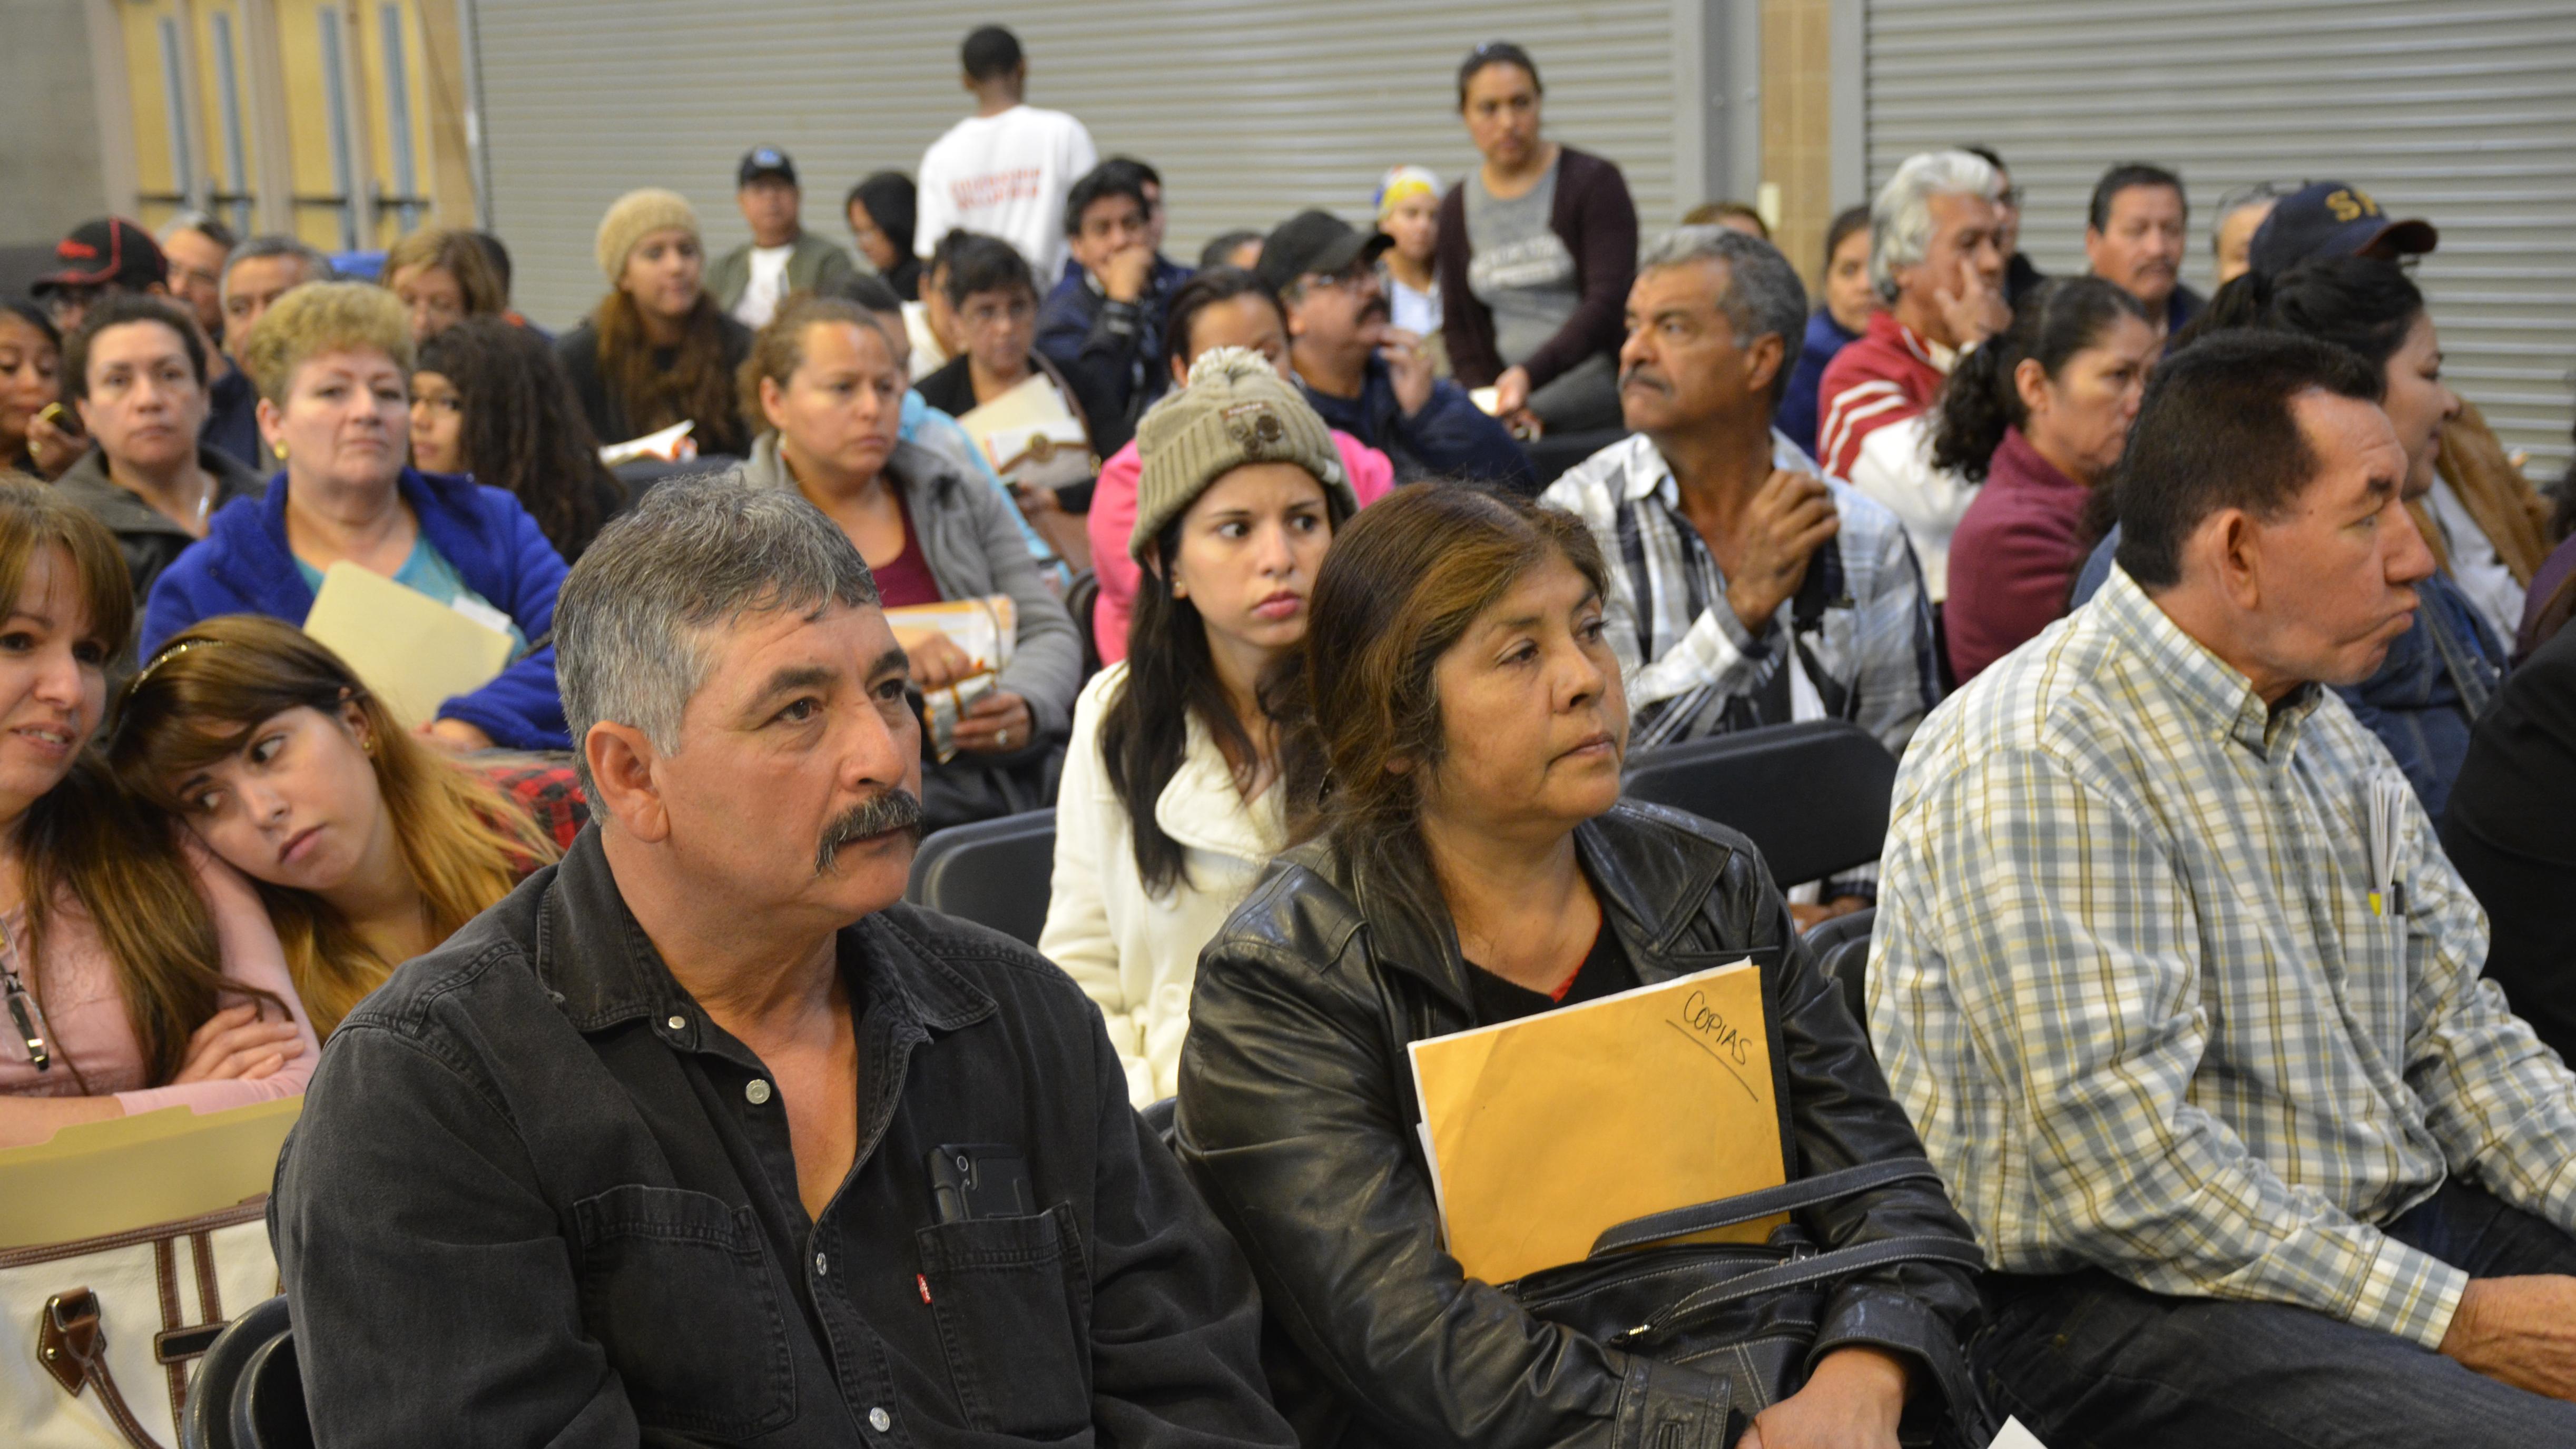 A citizenship drive in Las Vegas. Immigrants wait for help navigating the naturalization process. April 30, 2016